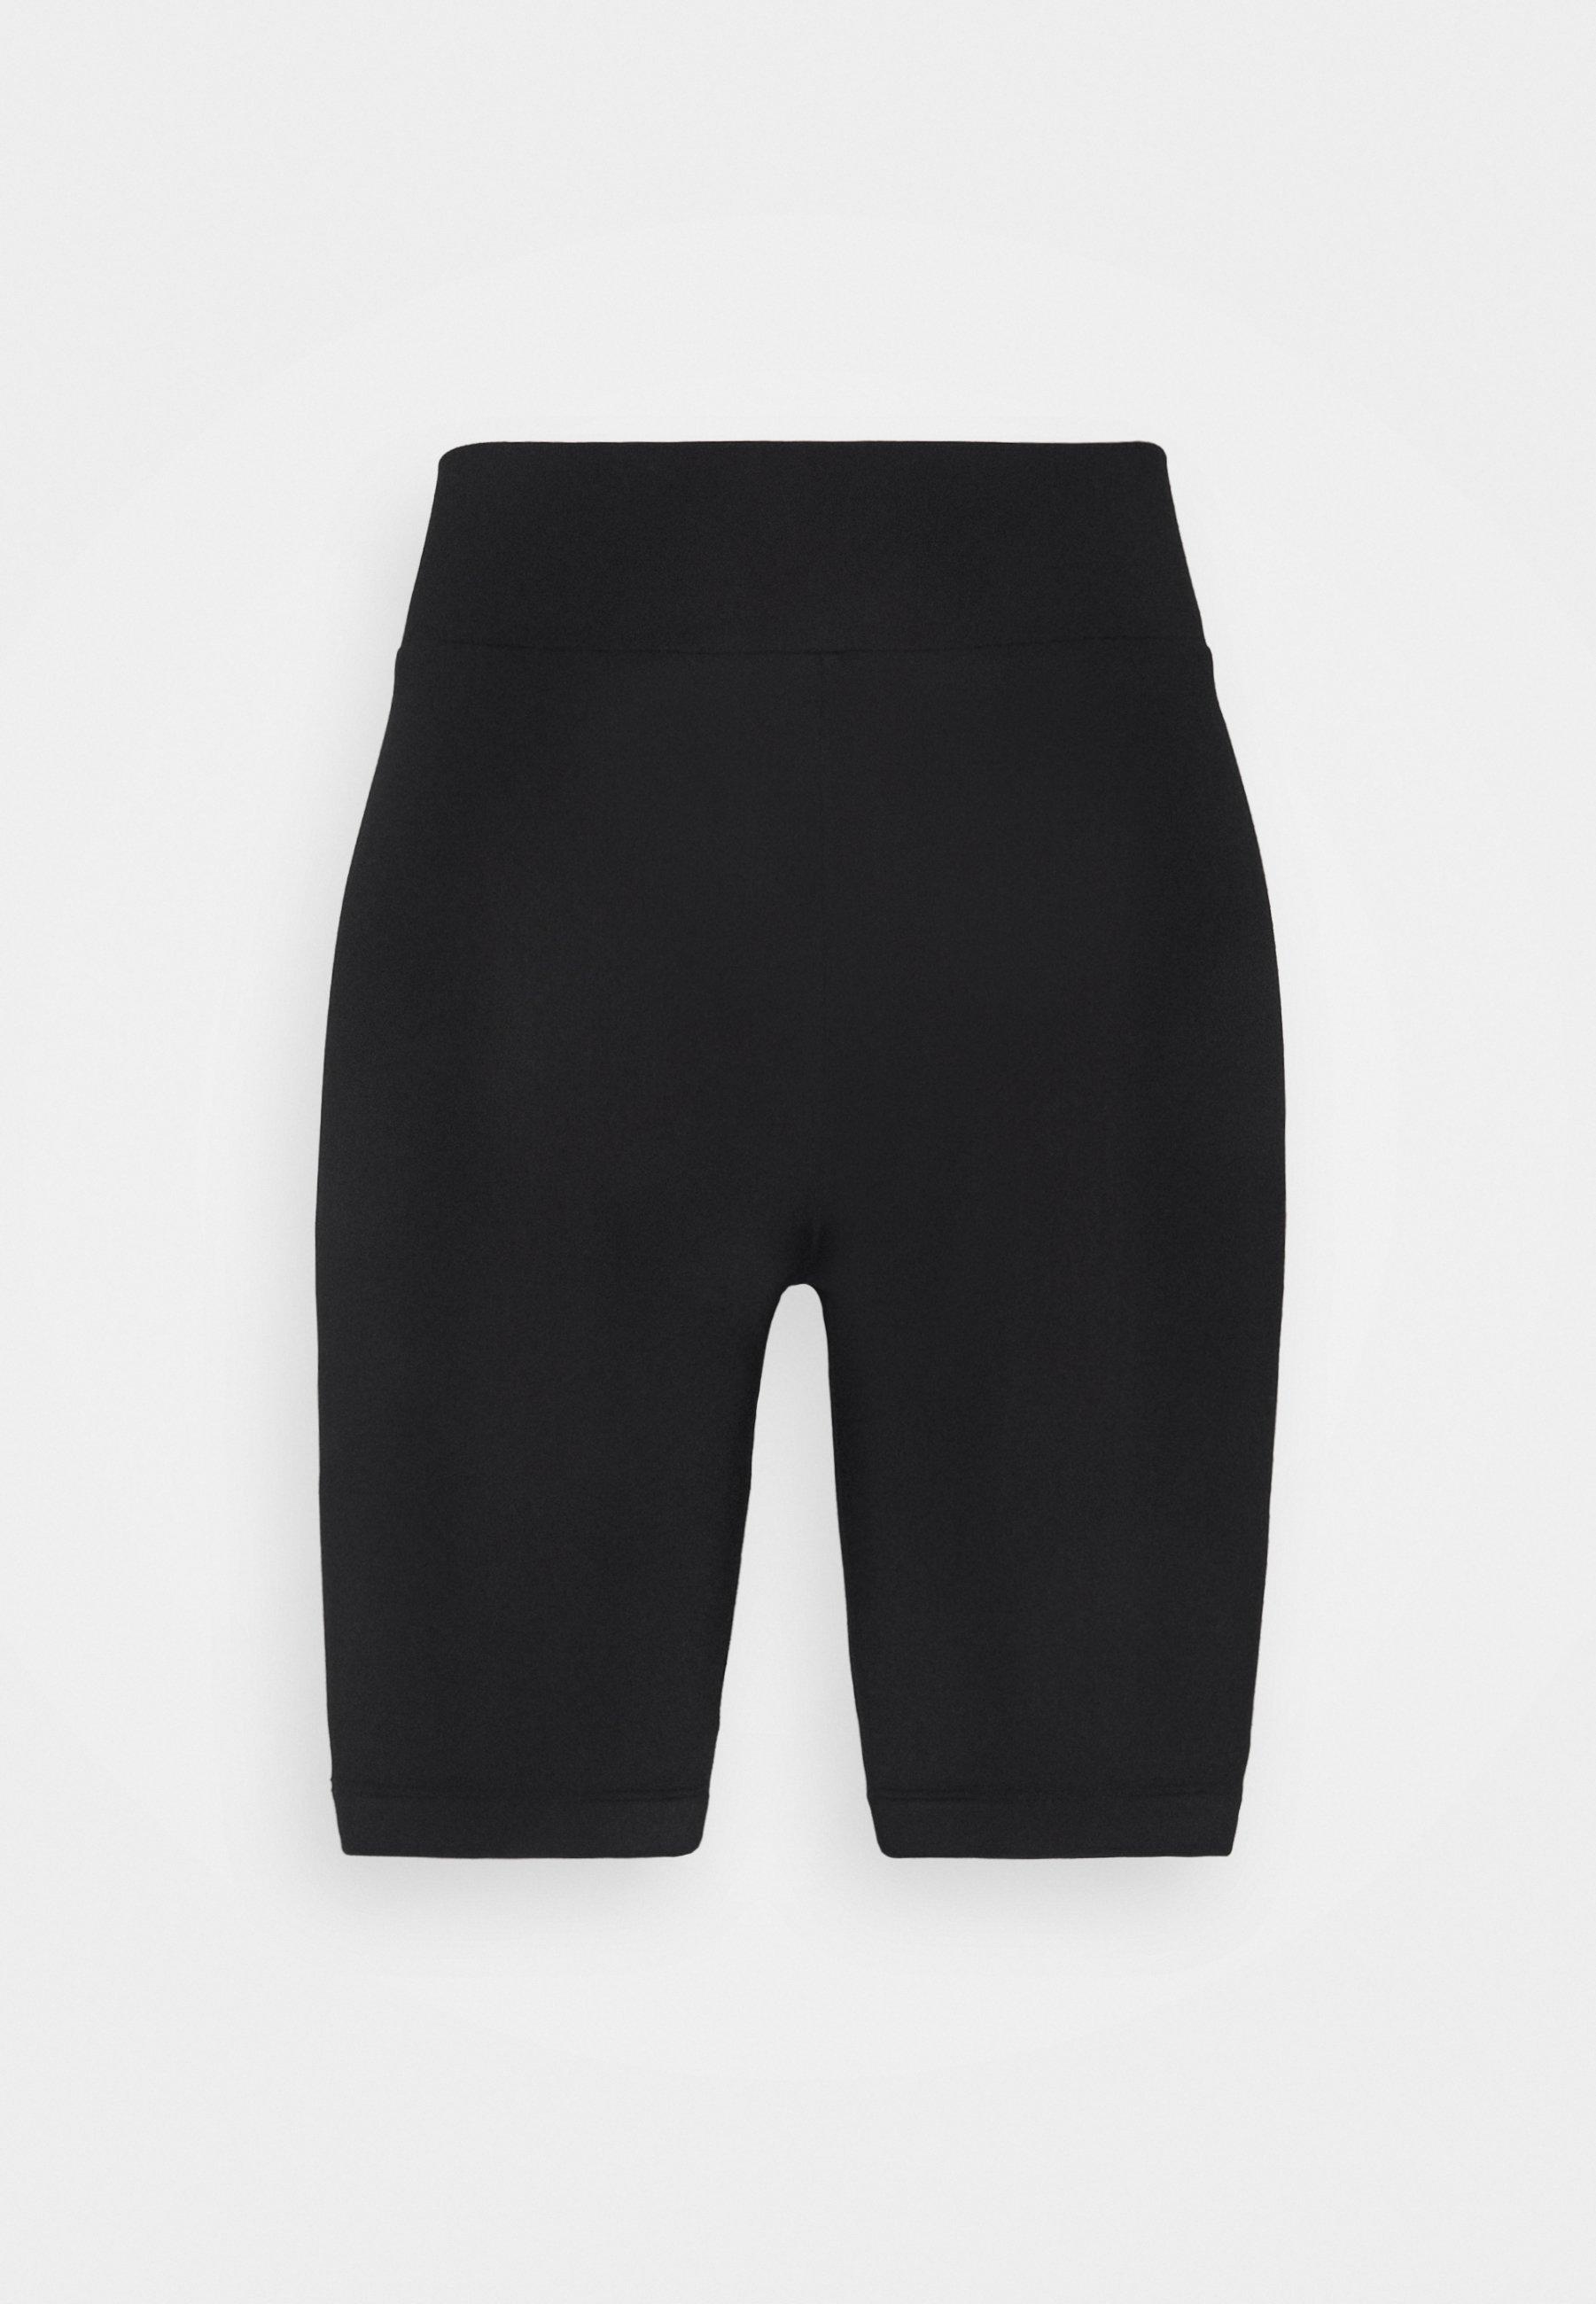 Femme PIPER BIKER PANTS - Short - black